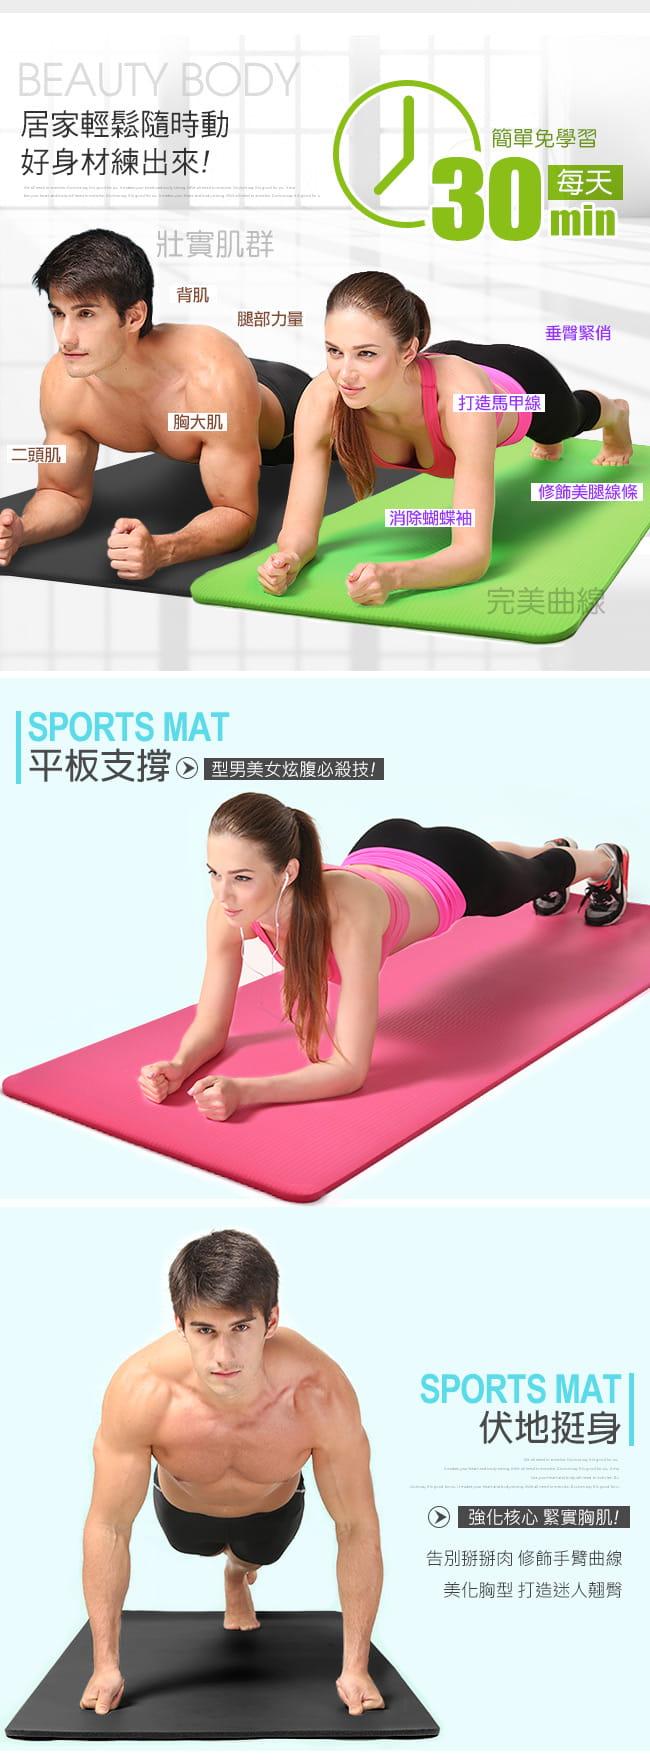 15MM加厚NBR健身墊(送束帶) 瑜珈墊止滑墊防滑墊運動墊 4